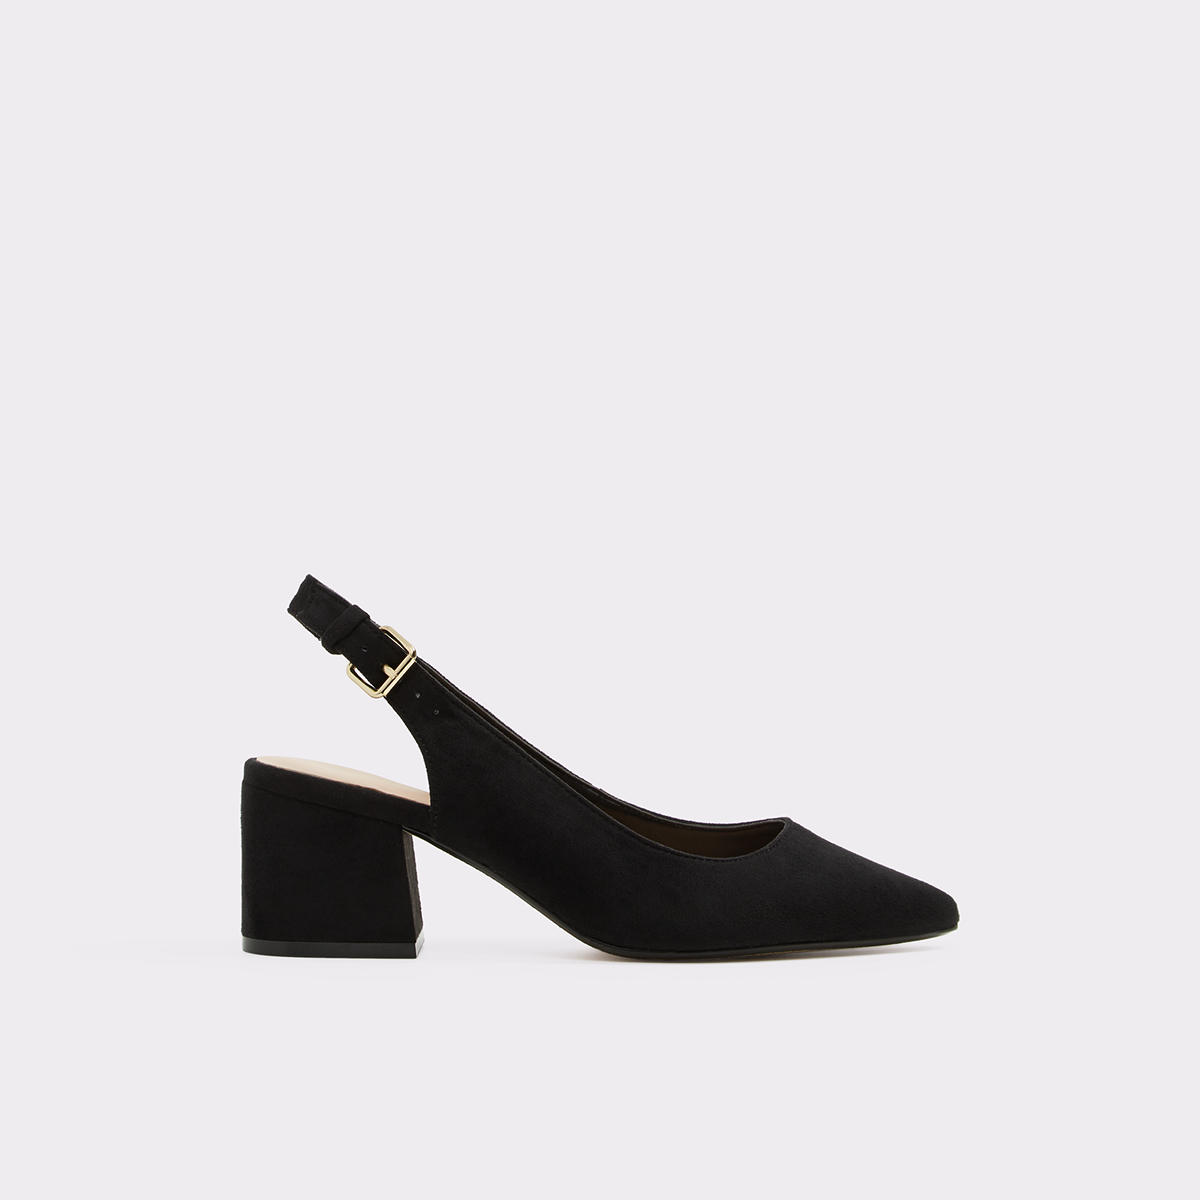 7c97a6ee2b9 Gauclya Midnight Black Women s Low-mid heels